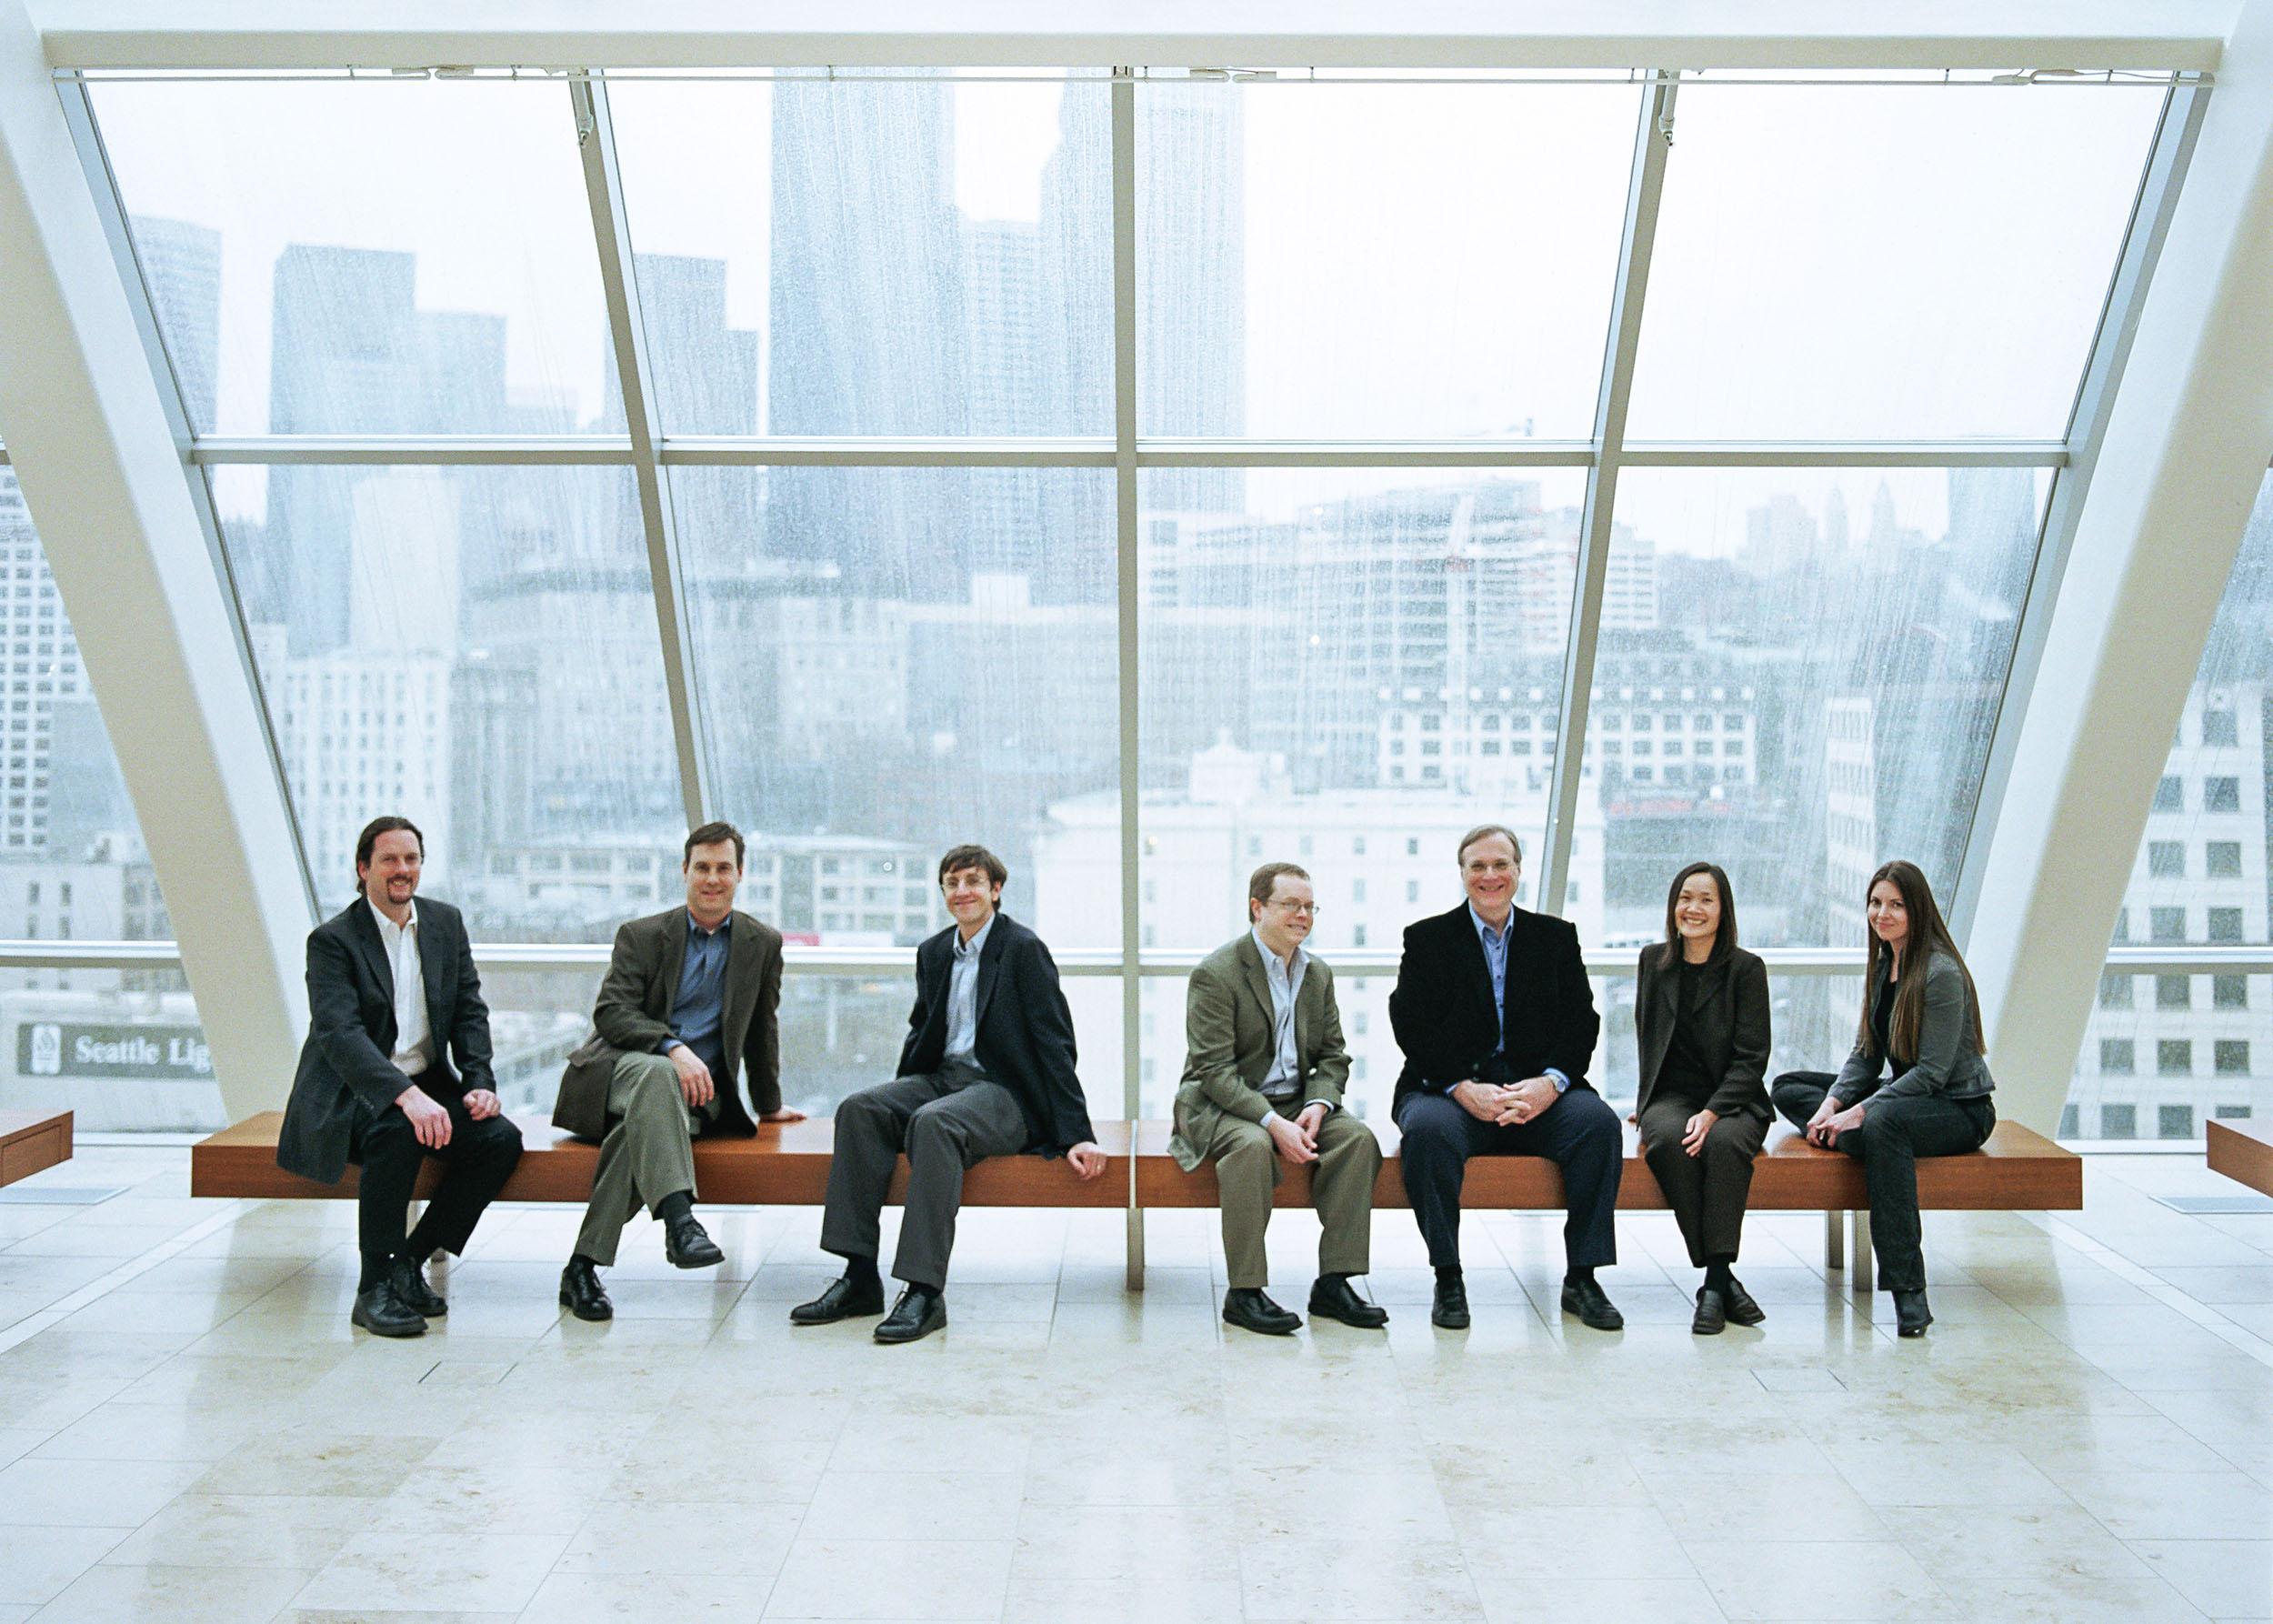 From left: Ed Lein, Paul Wohnoutka, Michael Hawrylycz, Allan Jones, Paul Allen, Chinh Dang, Carey Teemer, Photography by Bryce Duffy